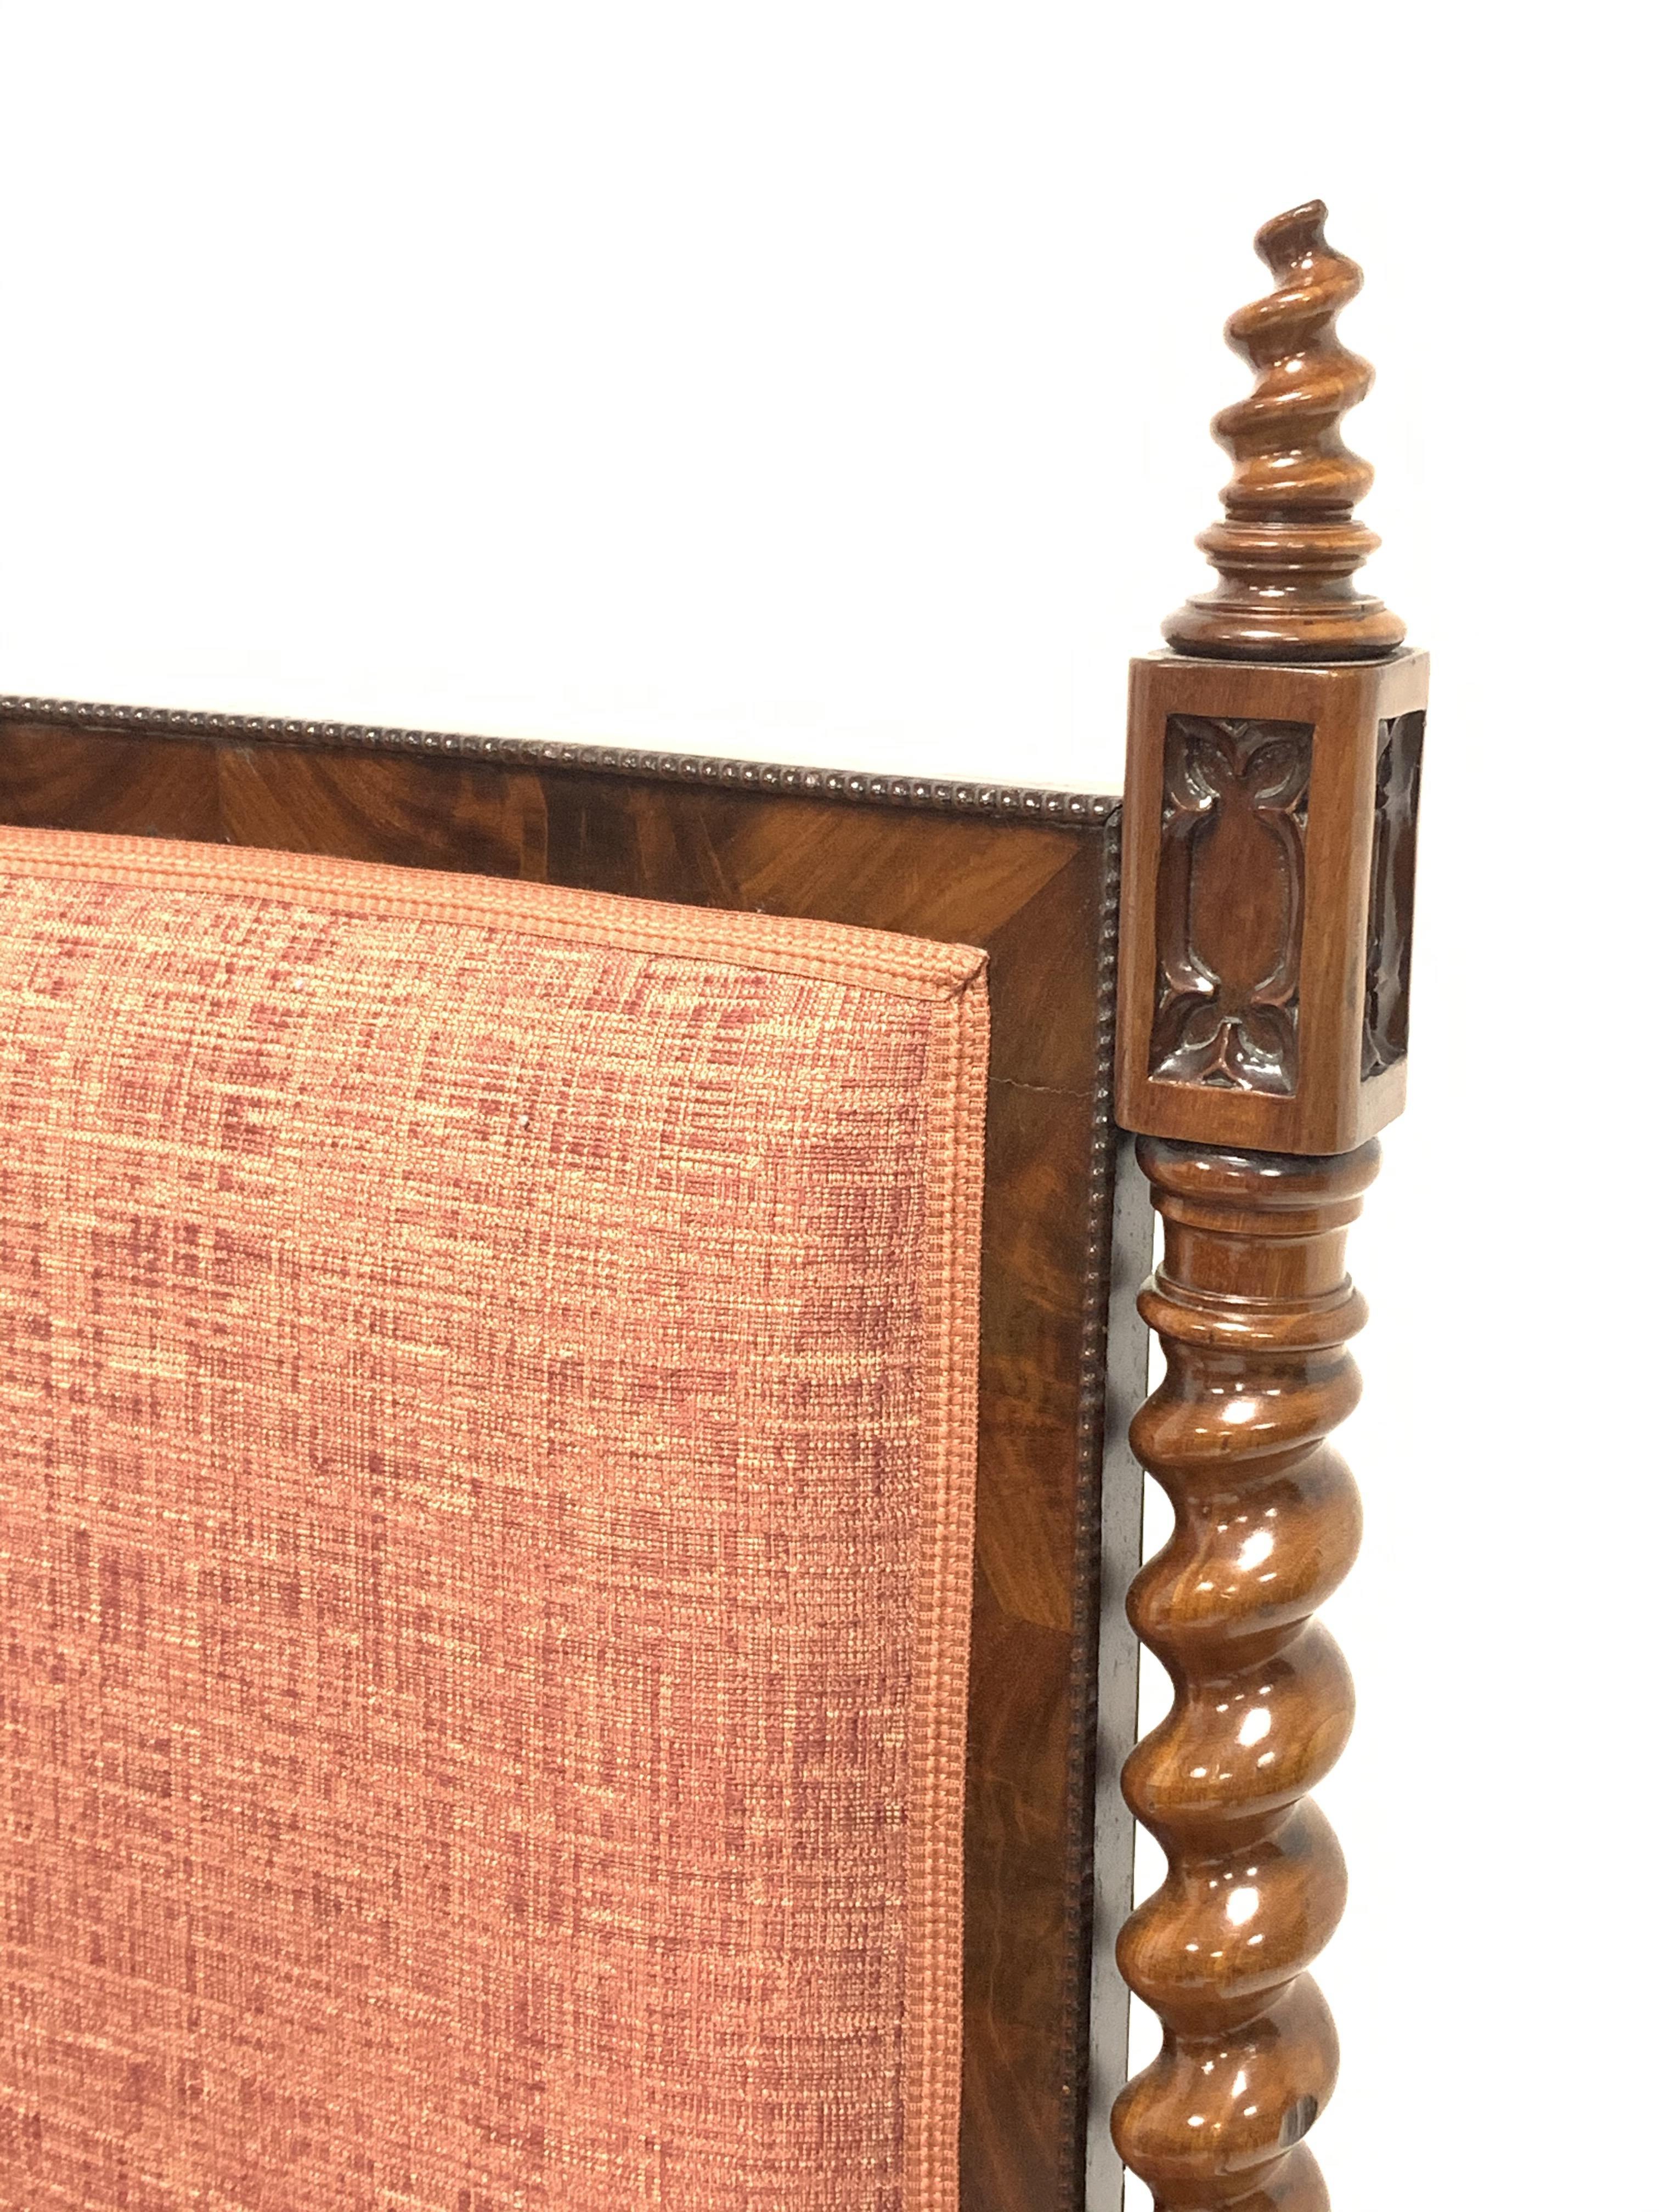 19th century Puginesque mahogany throne chair - Image 2 of 6